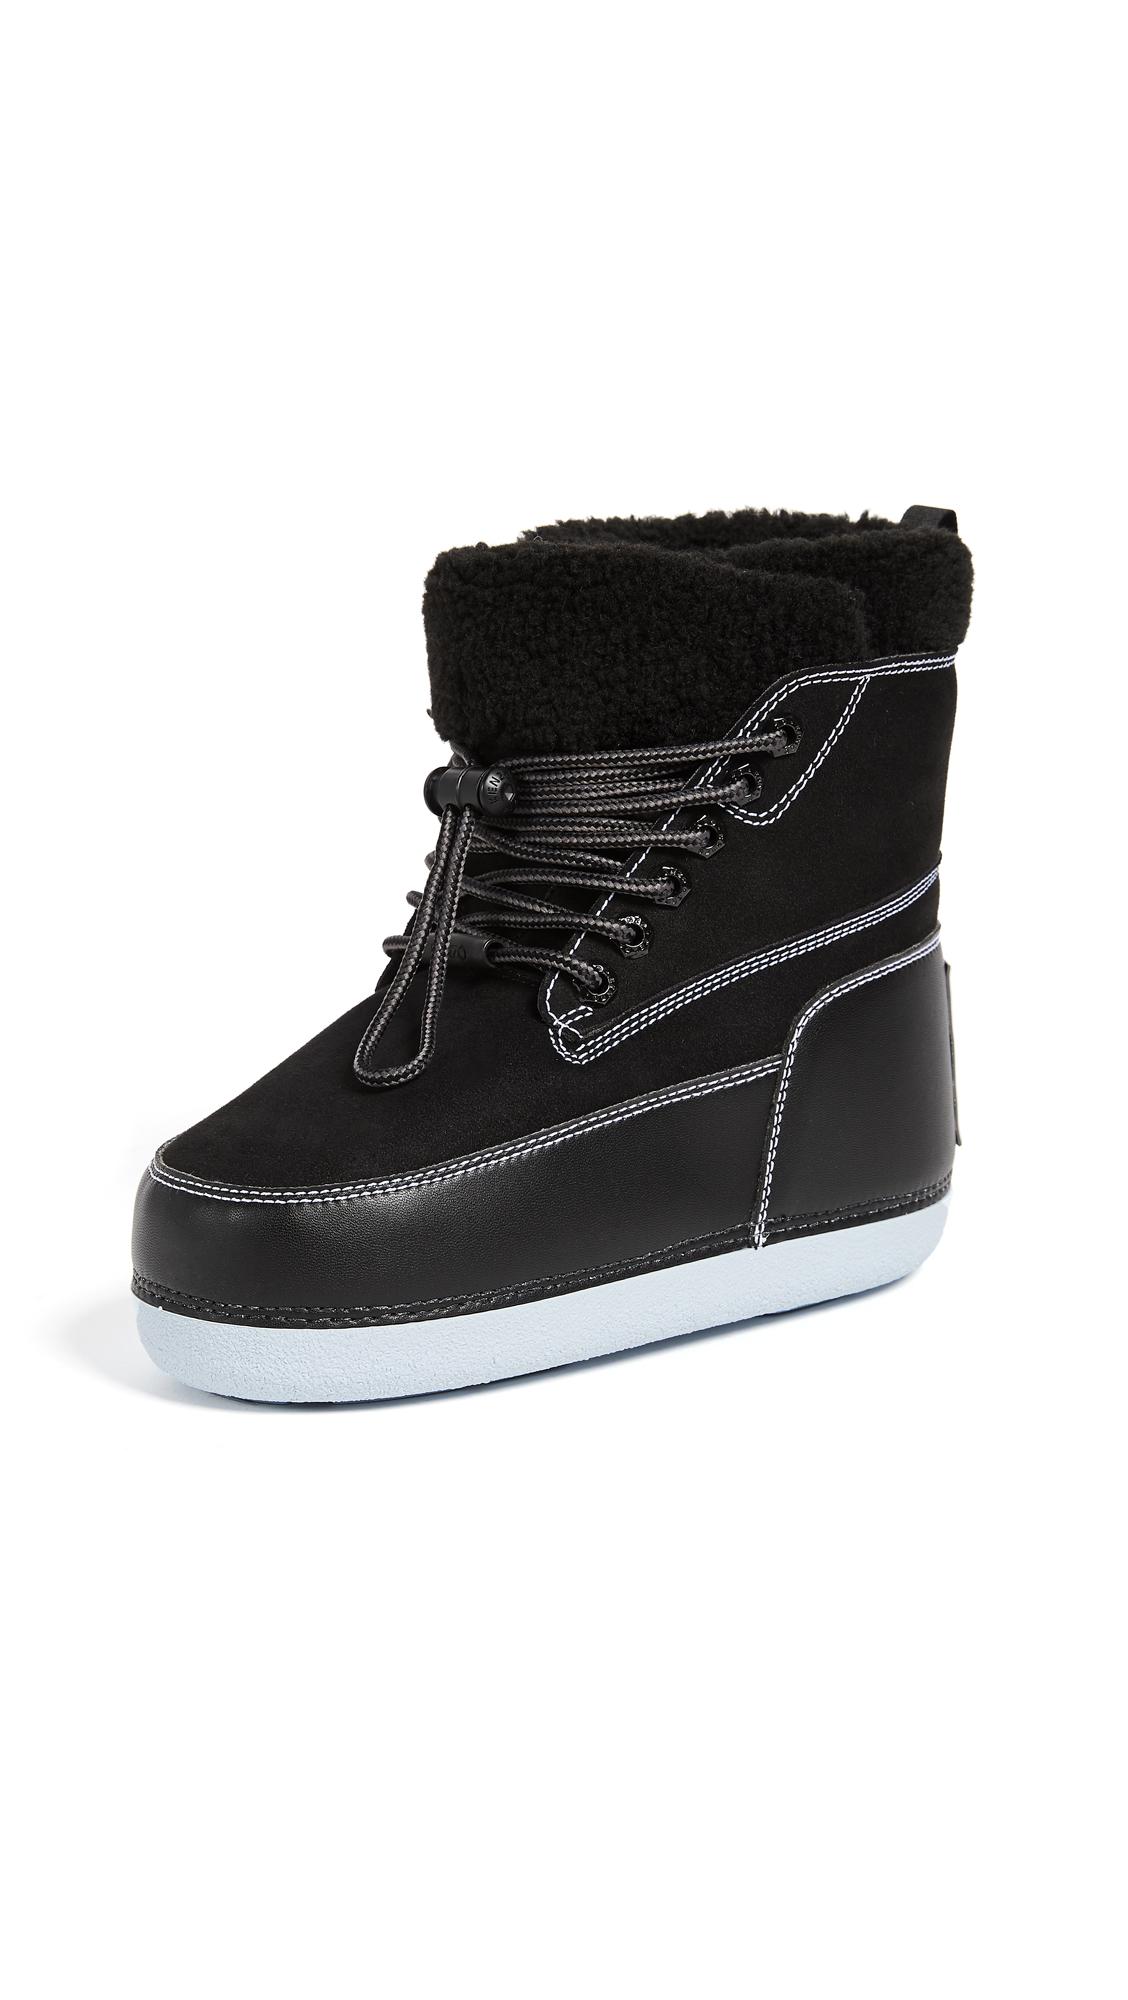 KENZO Nebraska Boots - Black